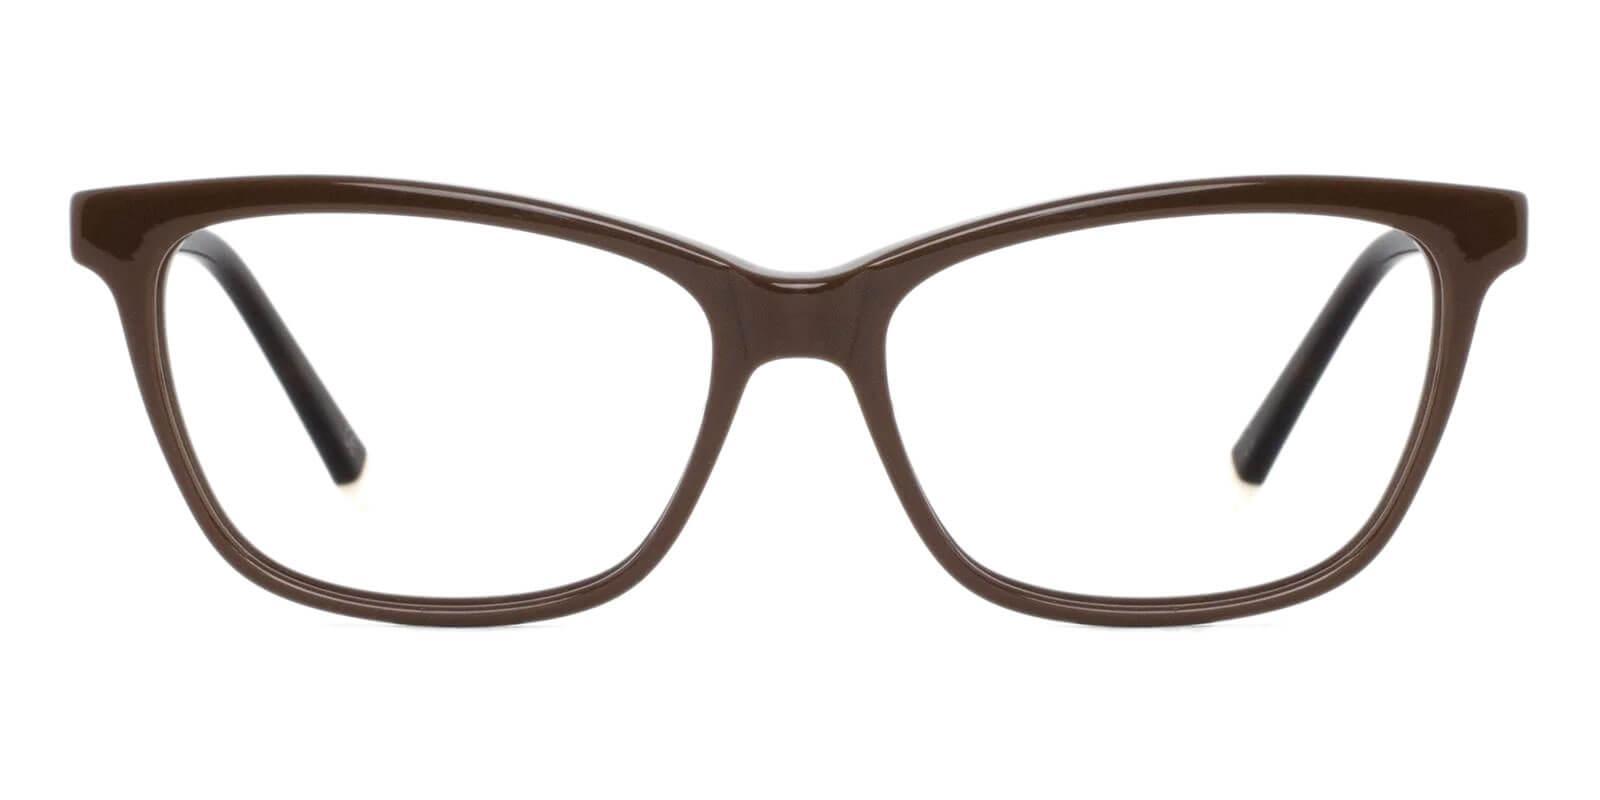 Estonia Brown Acetate Eyeglasses , SpringHinges , UniversalBridgeFit Frames from ABBE Glasses